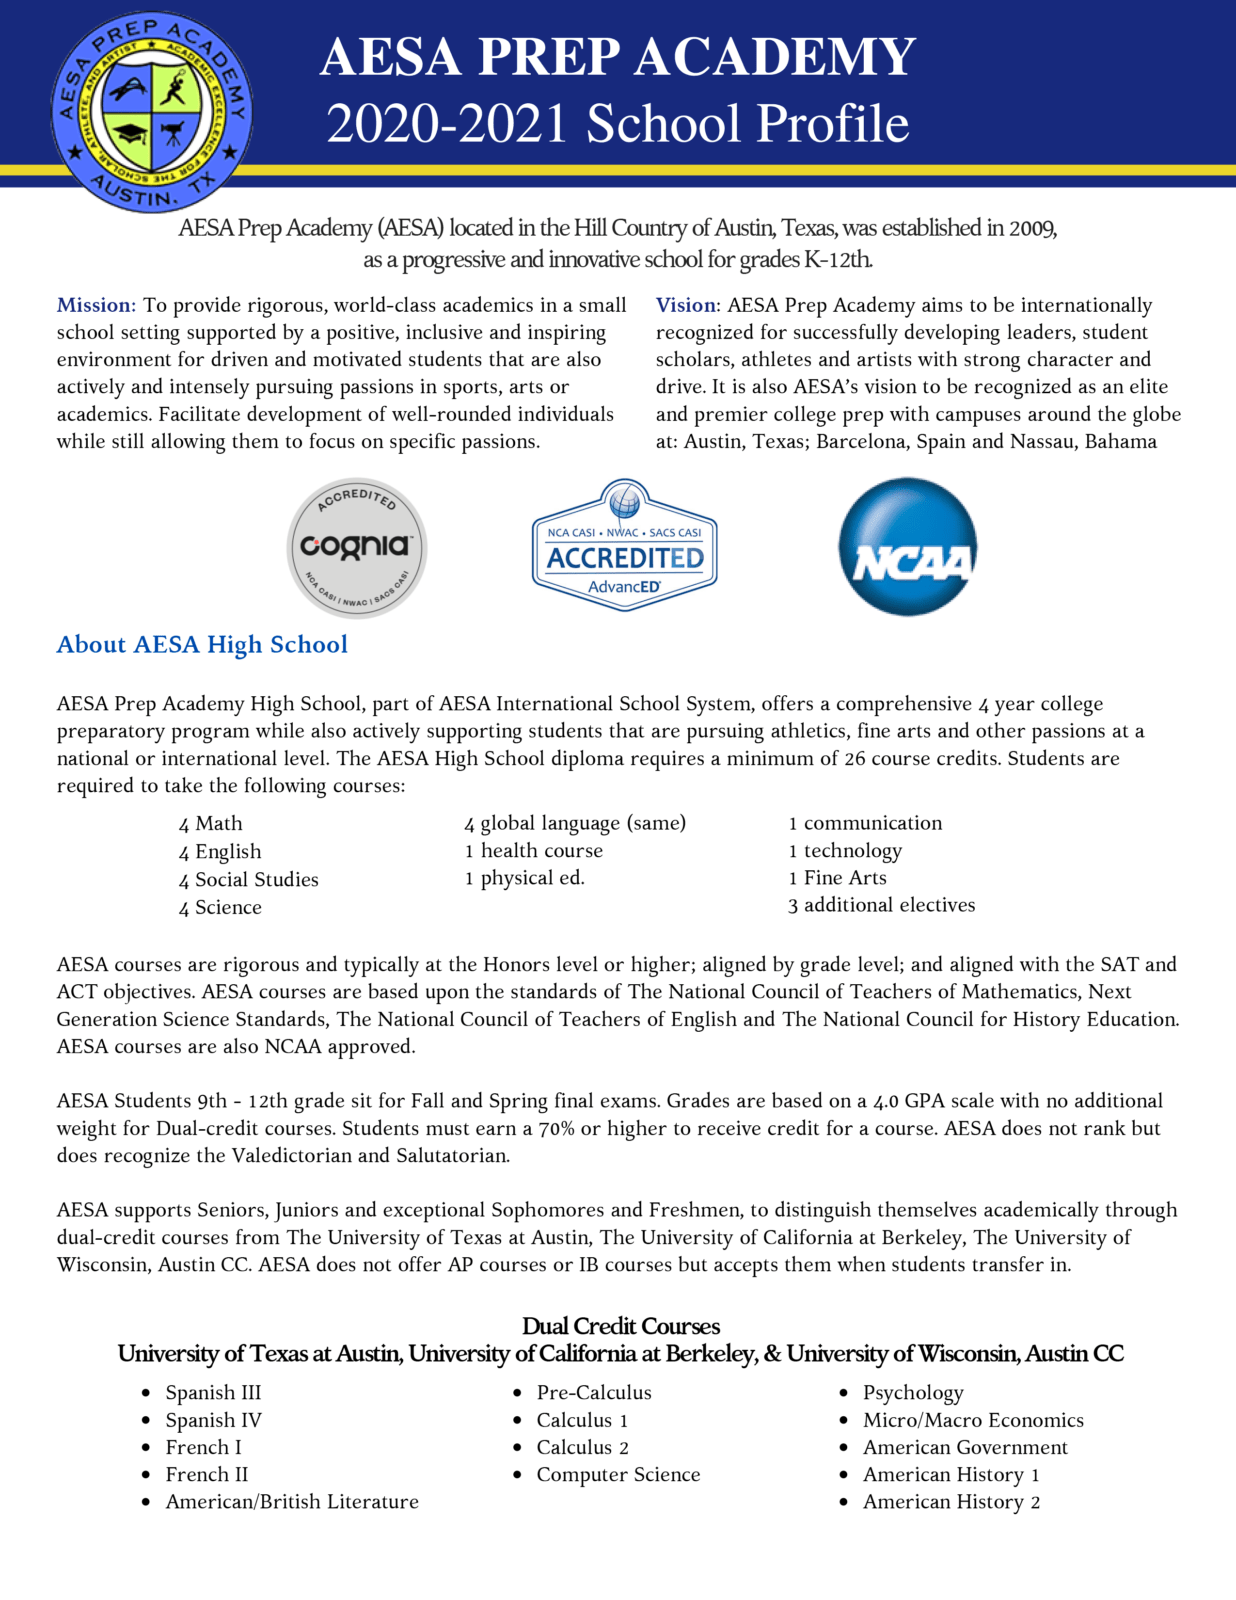 AESA School Profile